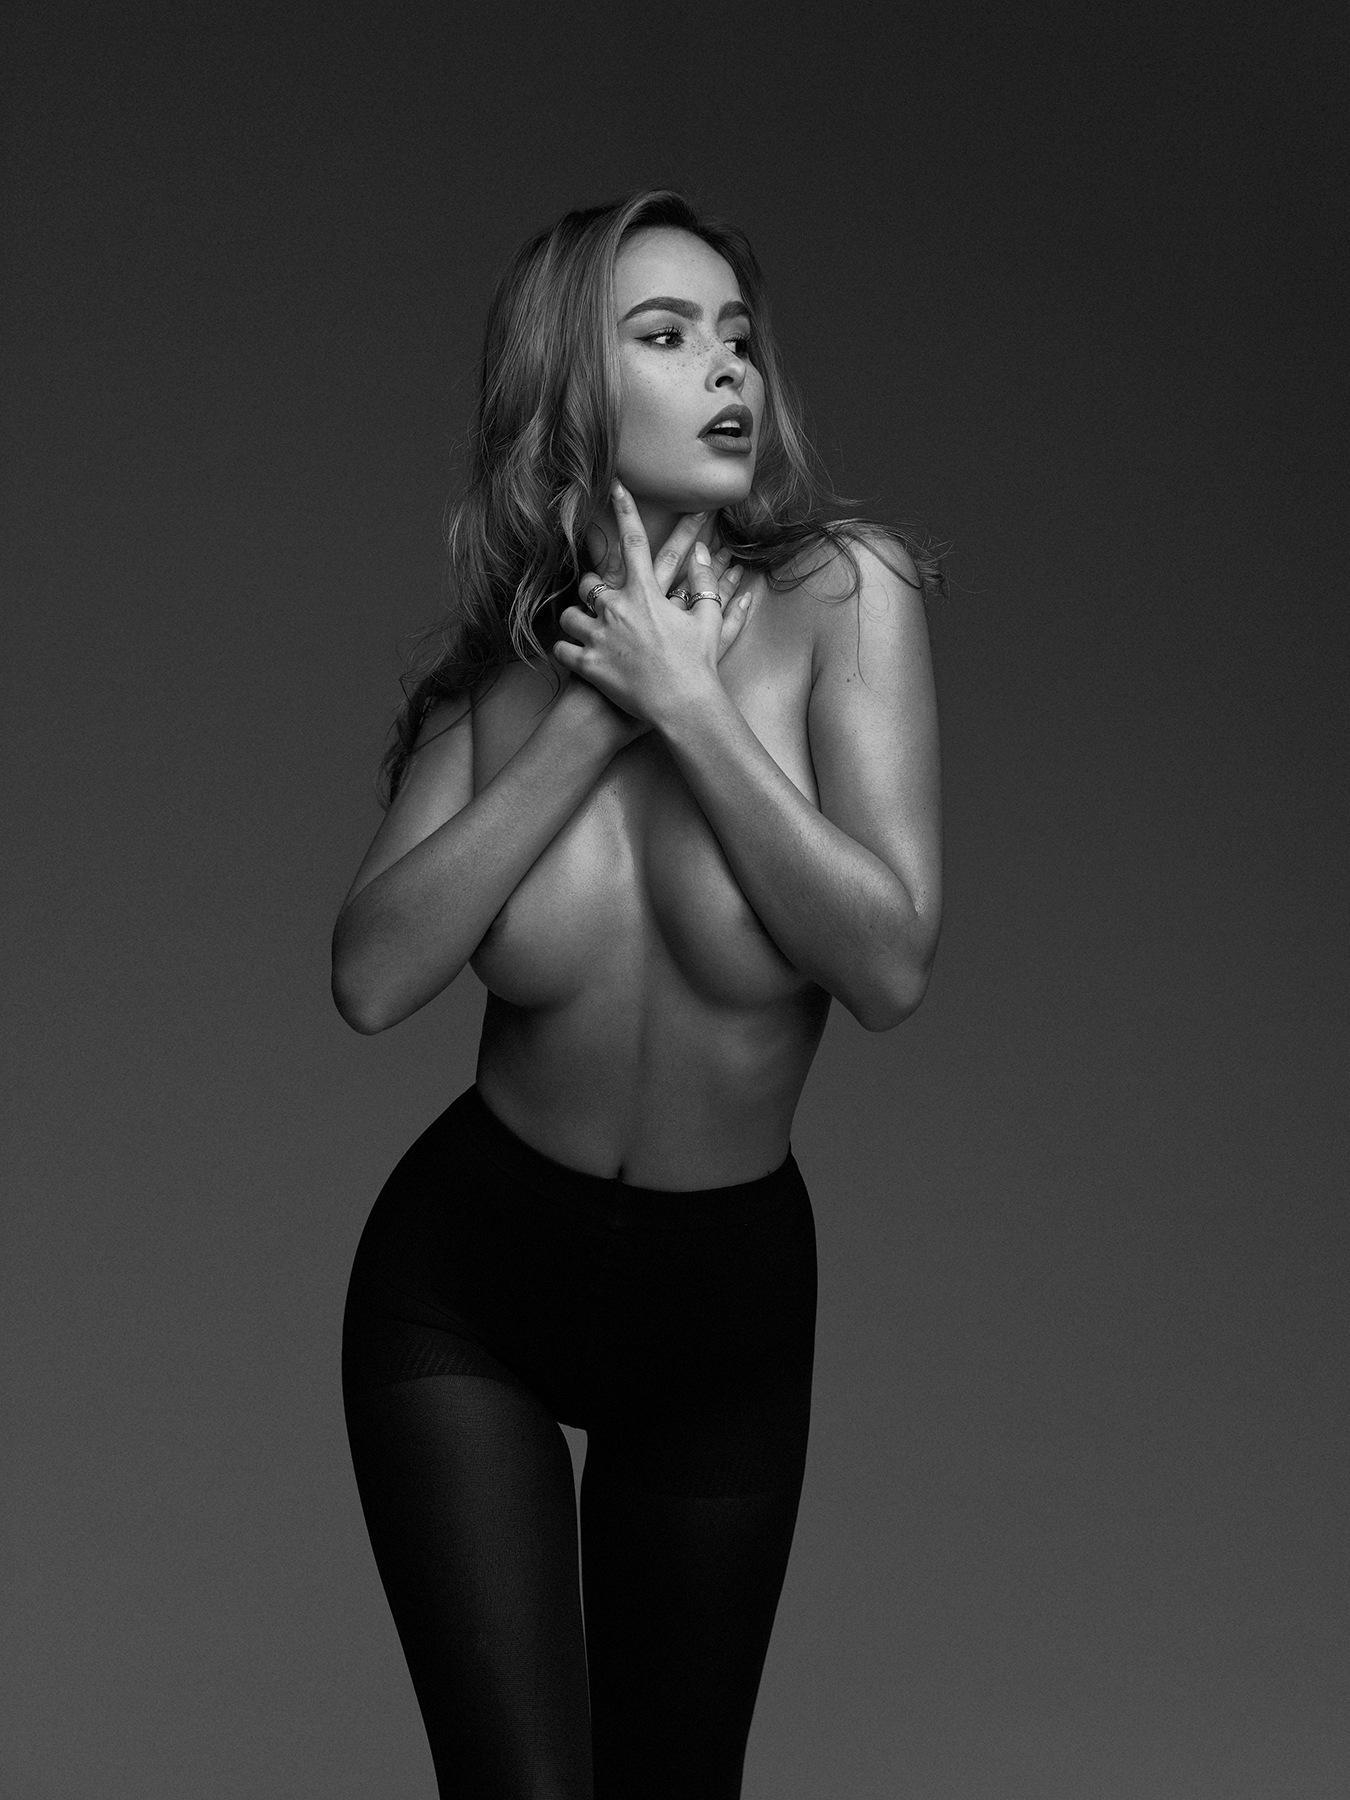 Elena Kamperi - Joakim Karlsson photoshoot